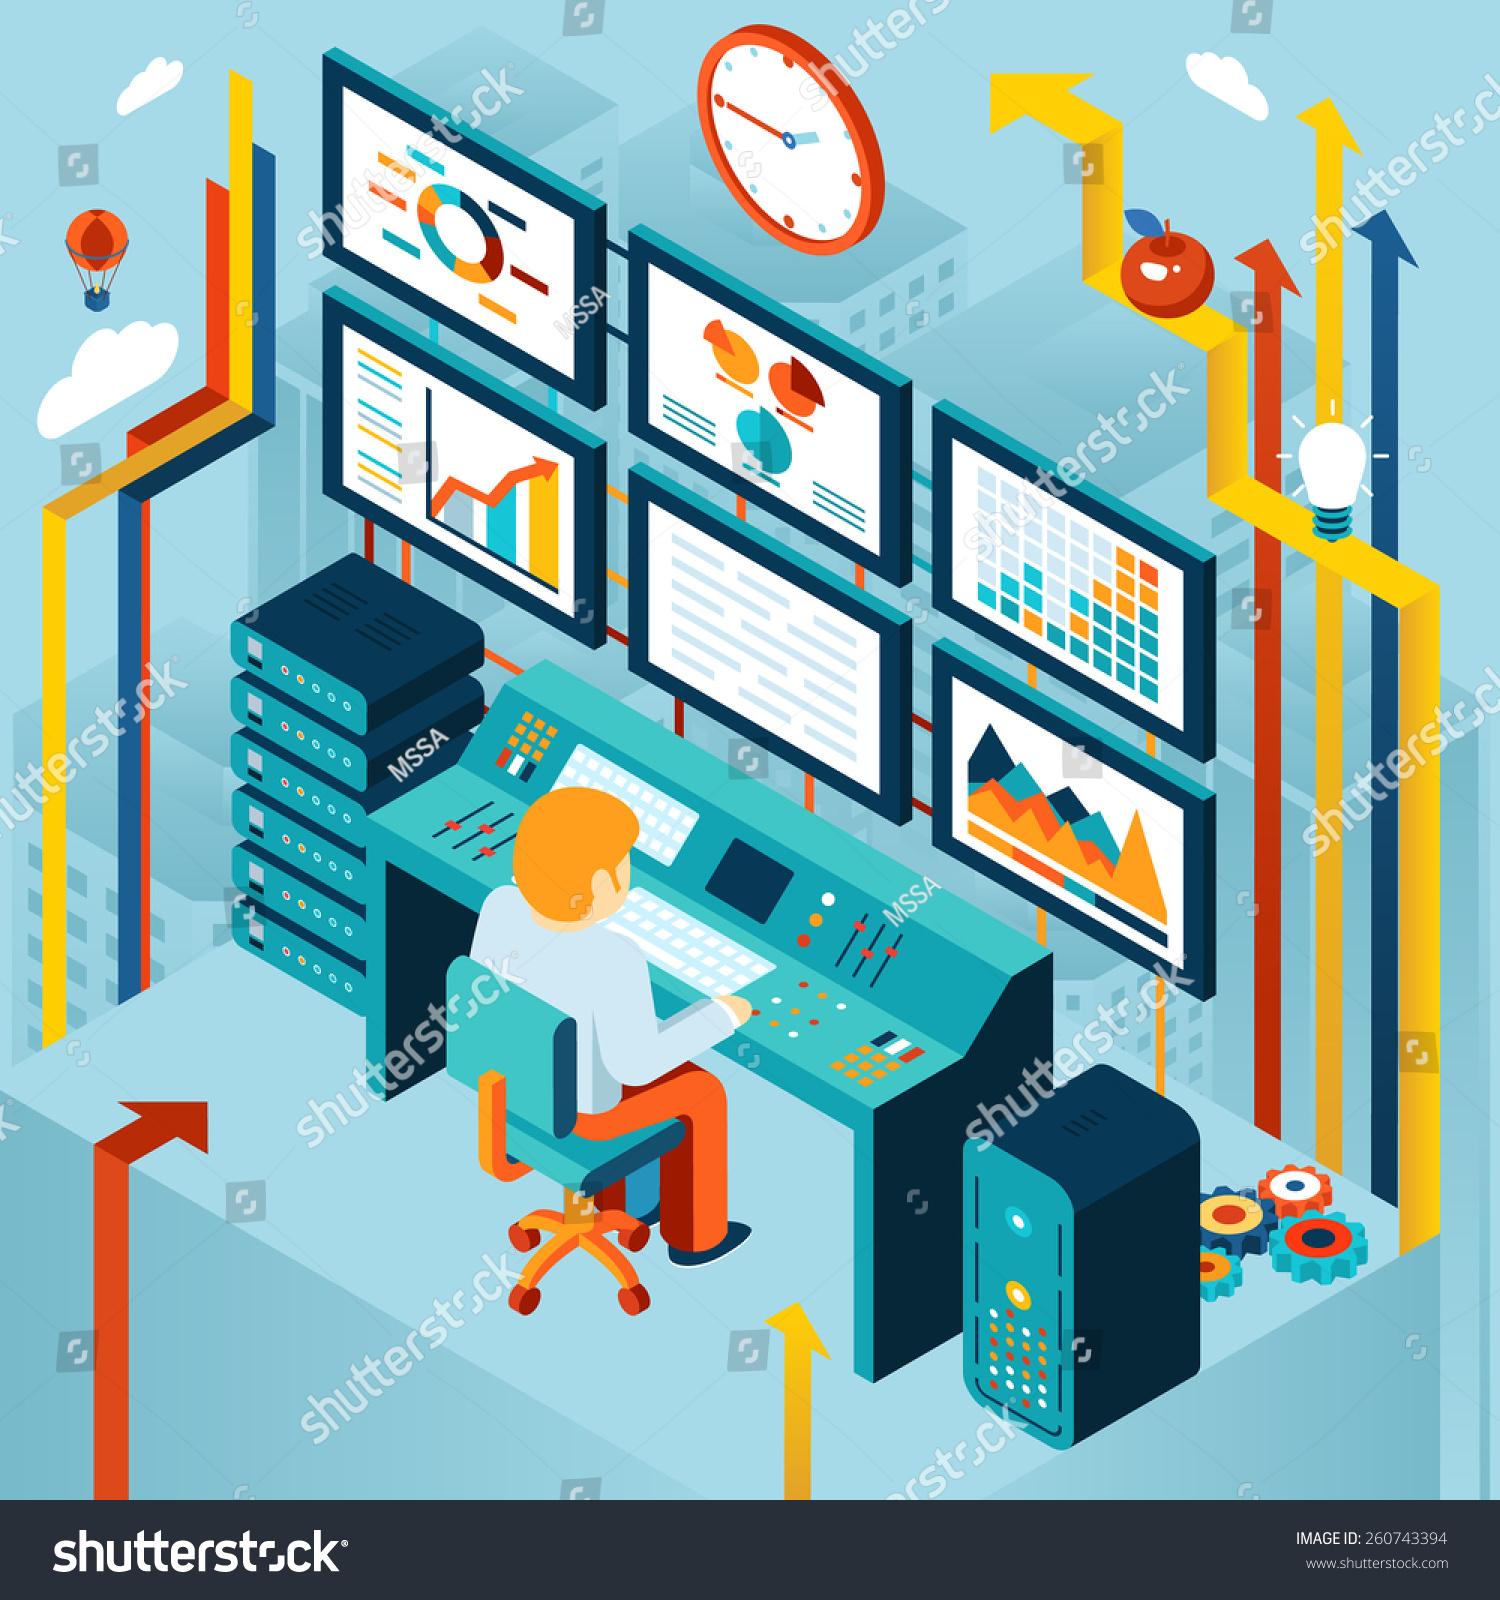 Financial Analytics Business Analysis Concept Development Stock ...